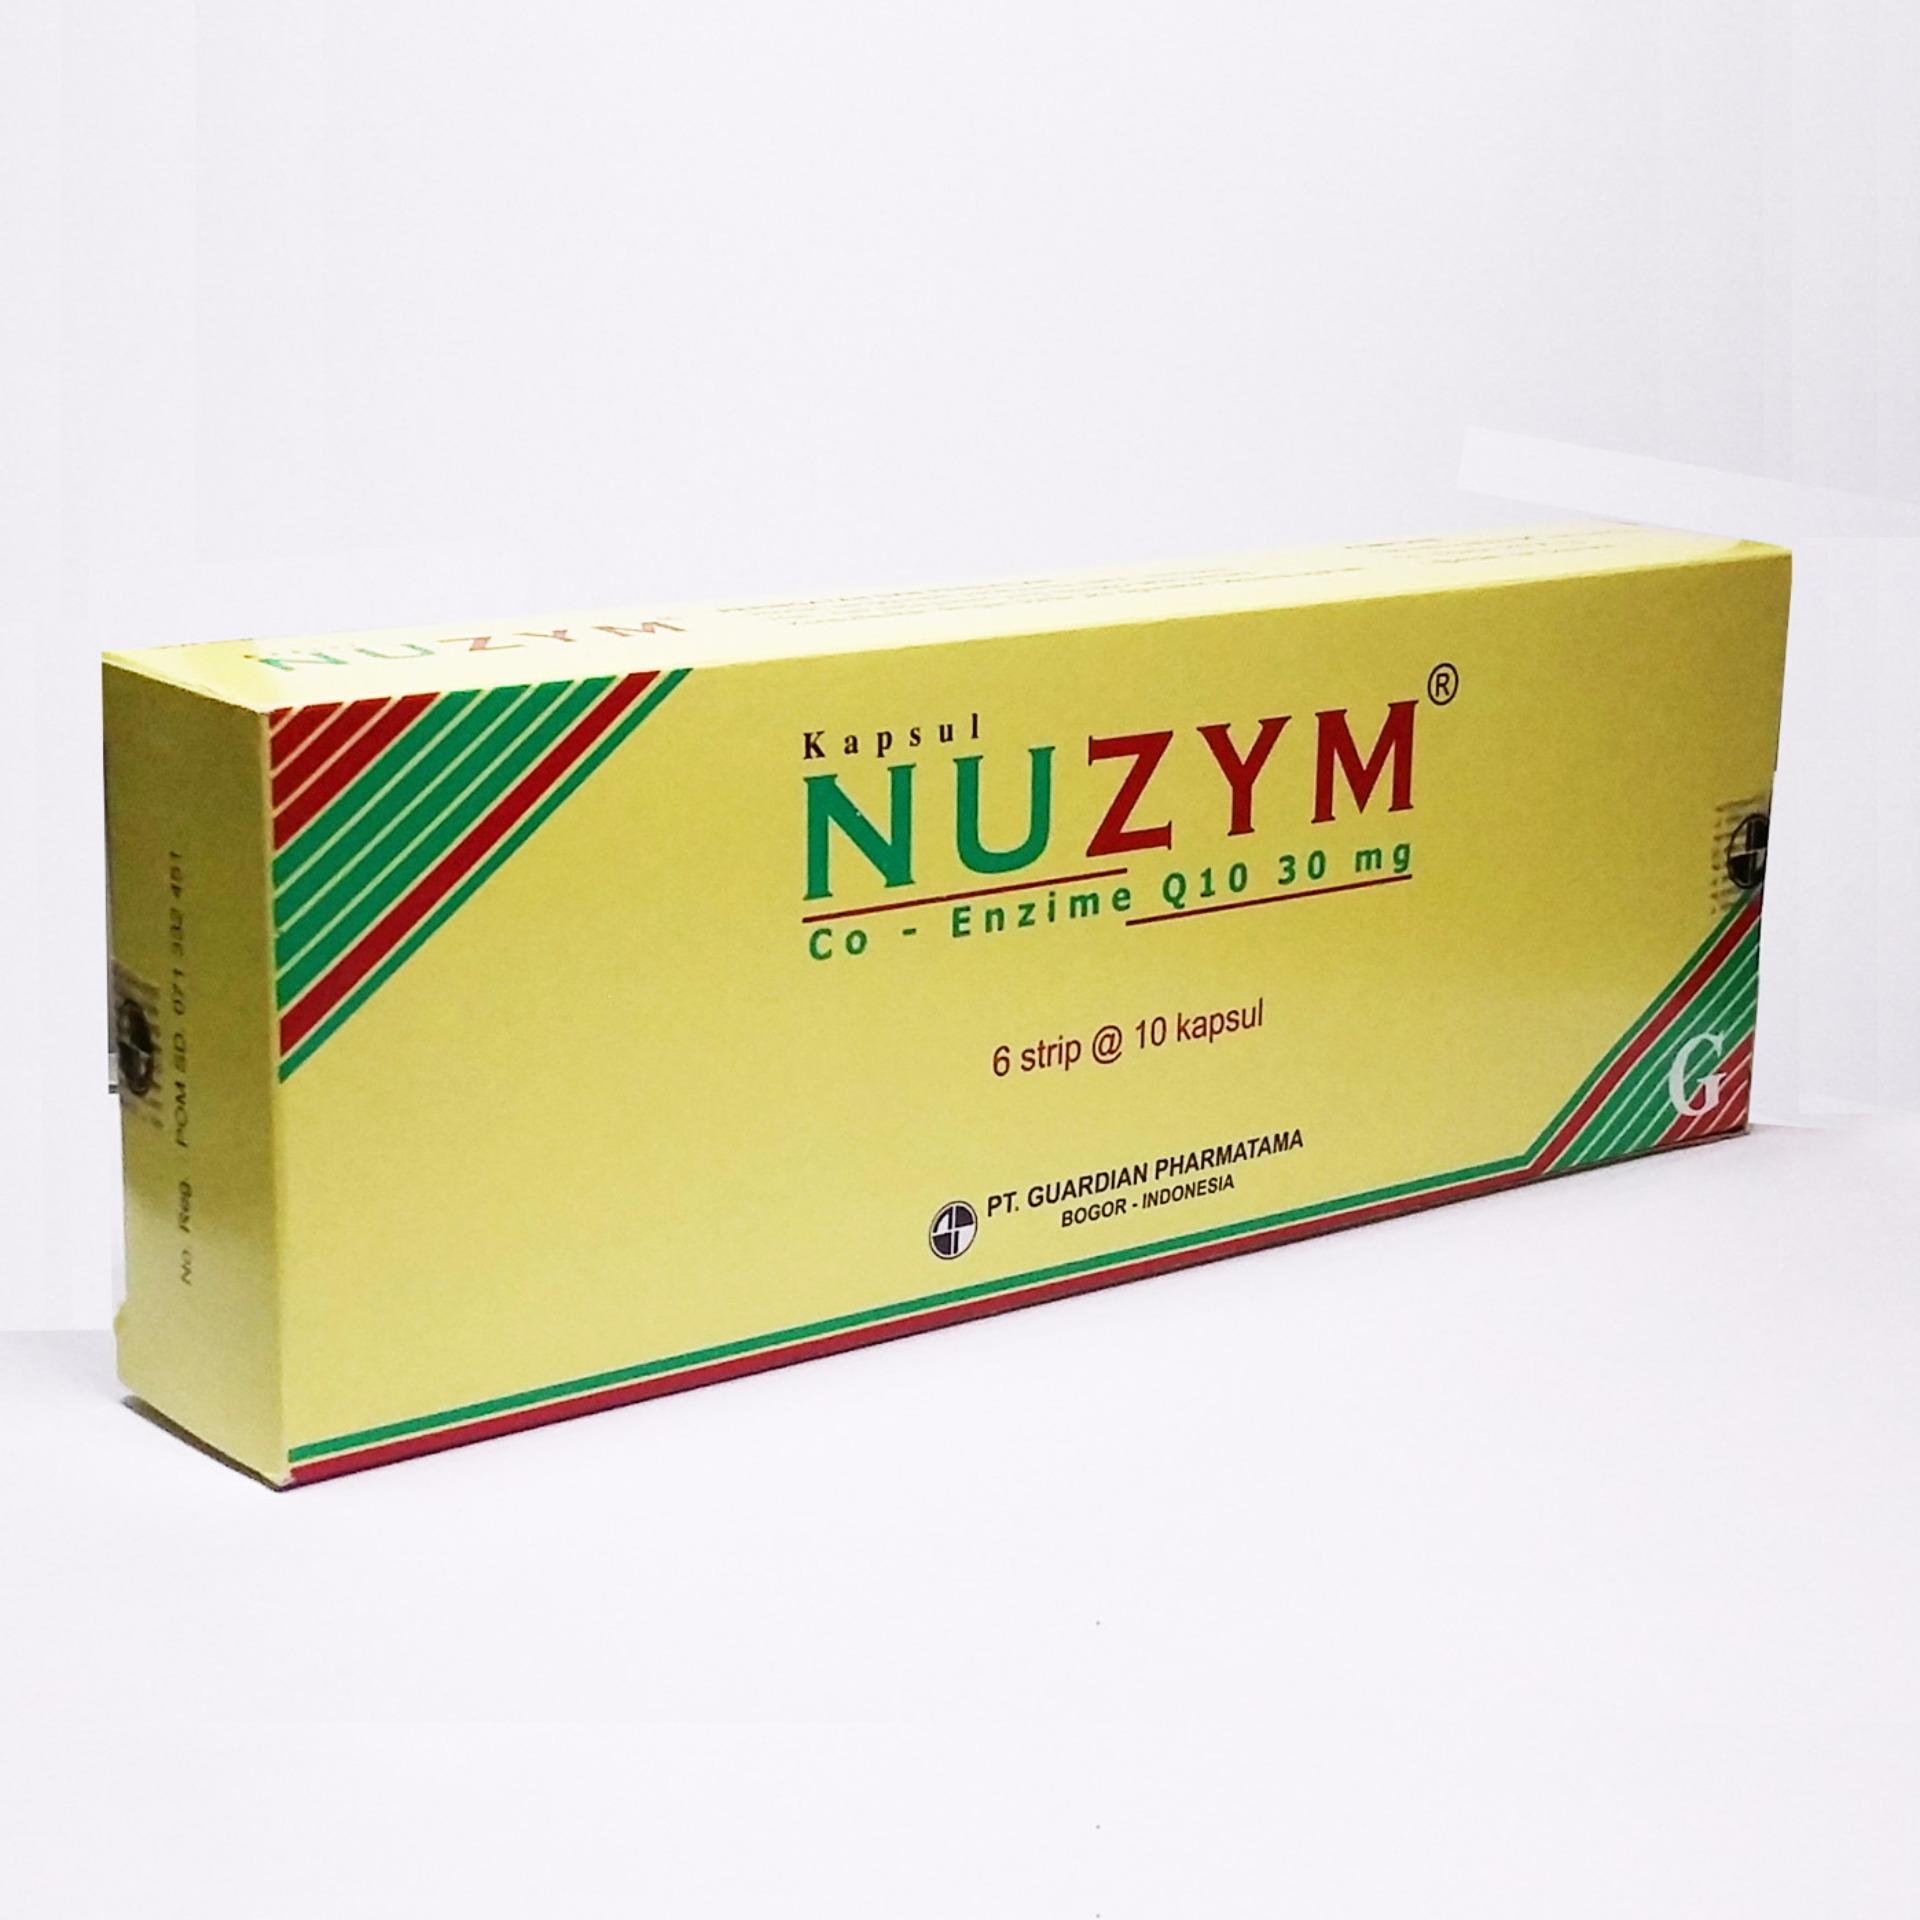 Delin Store - Nuzym Kapsul 1 Box